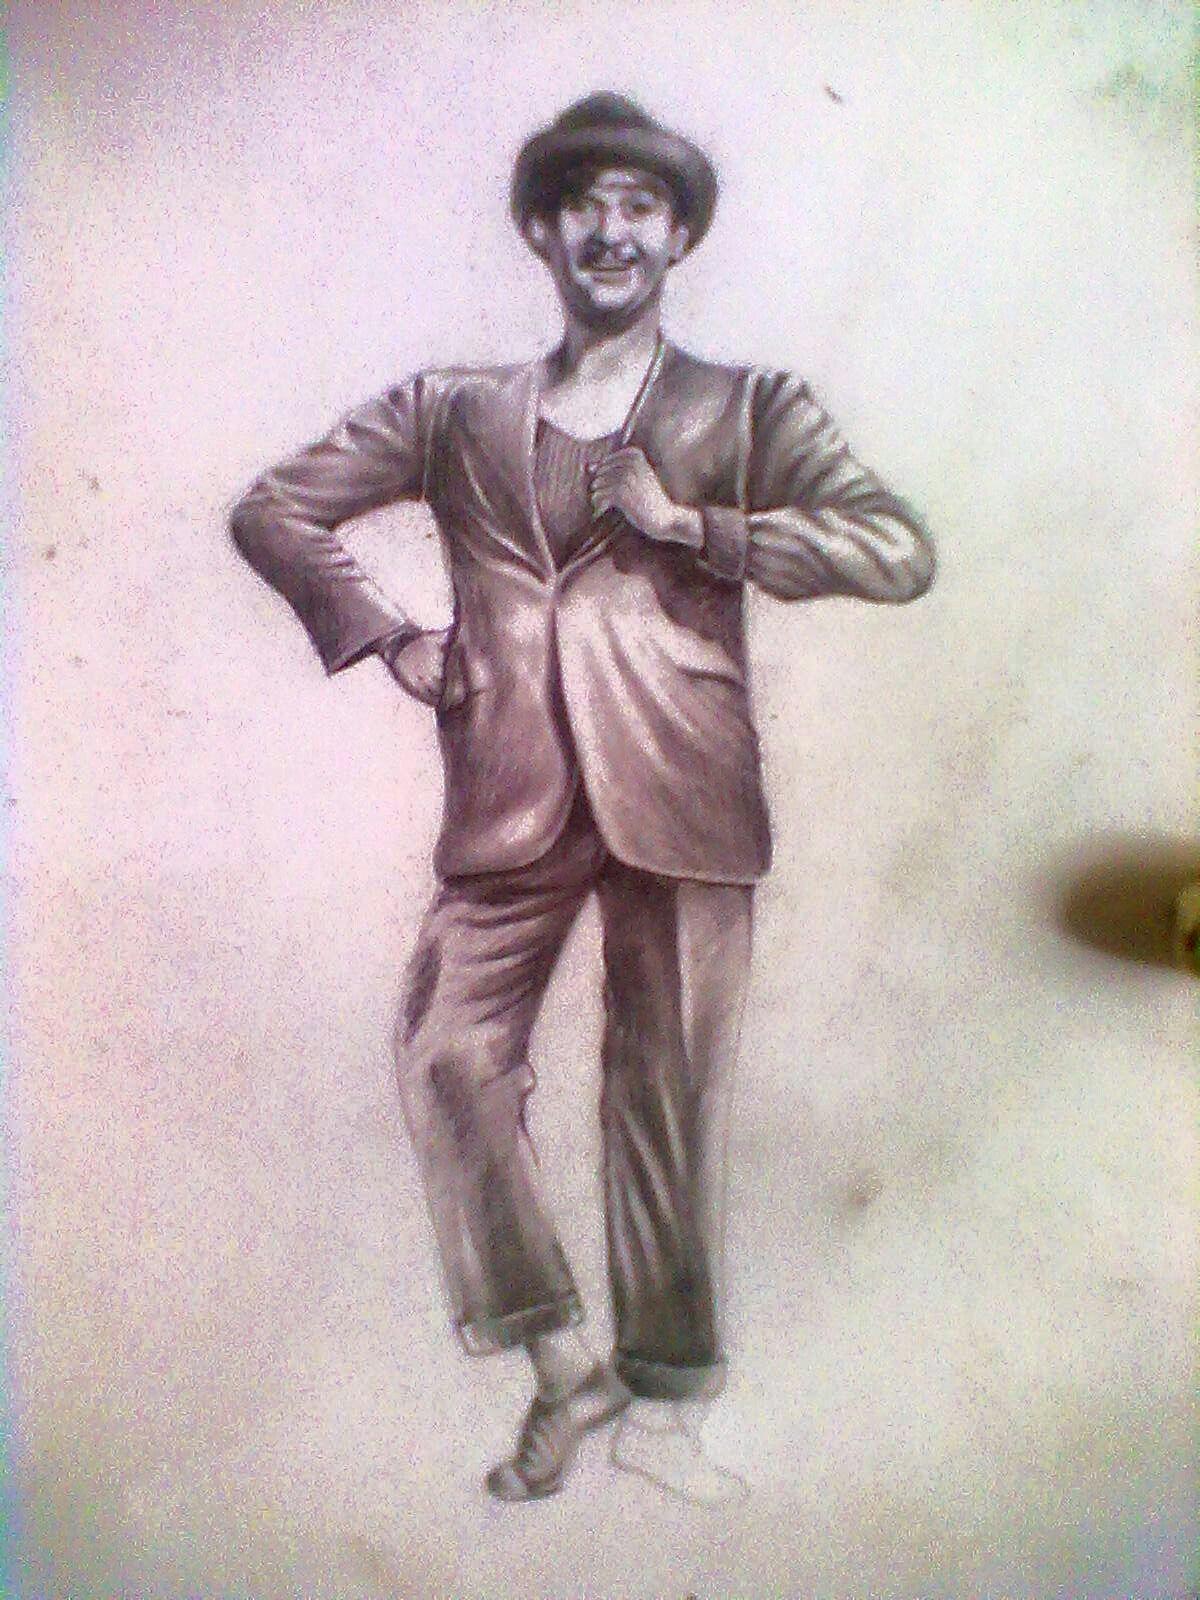 Joker raj kapoor pencil shading joker shades sketches croquis draw